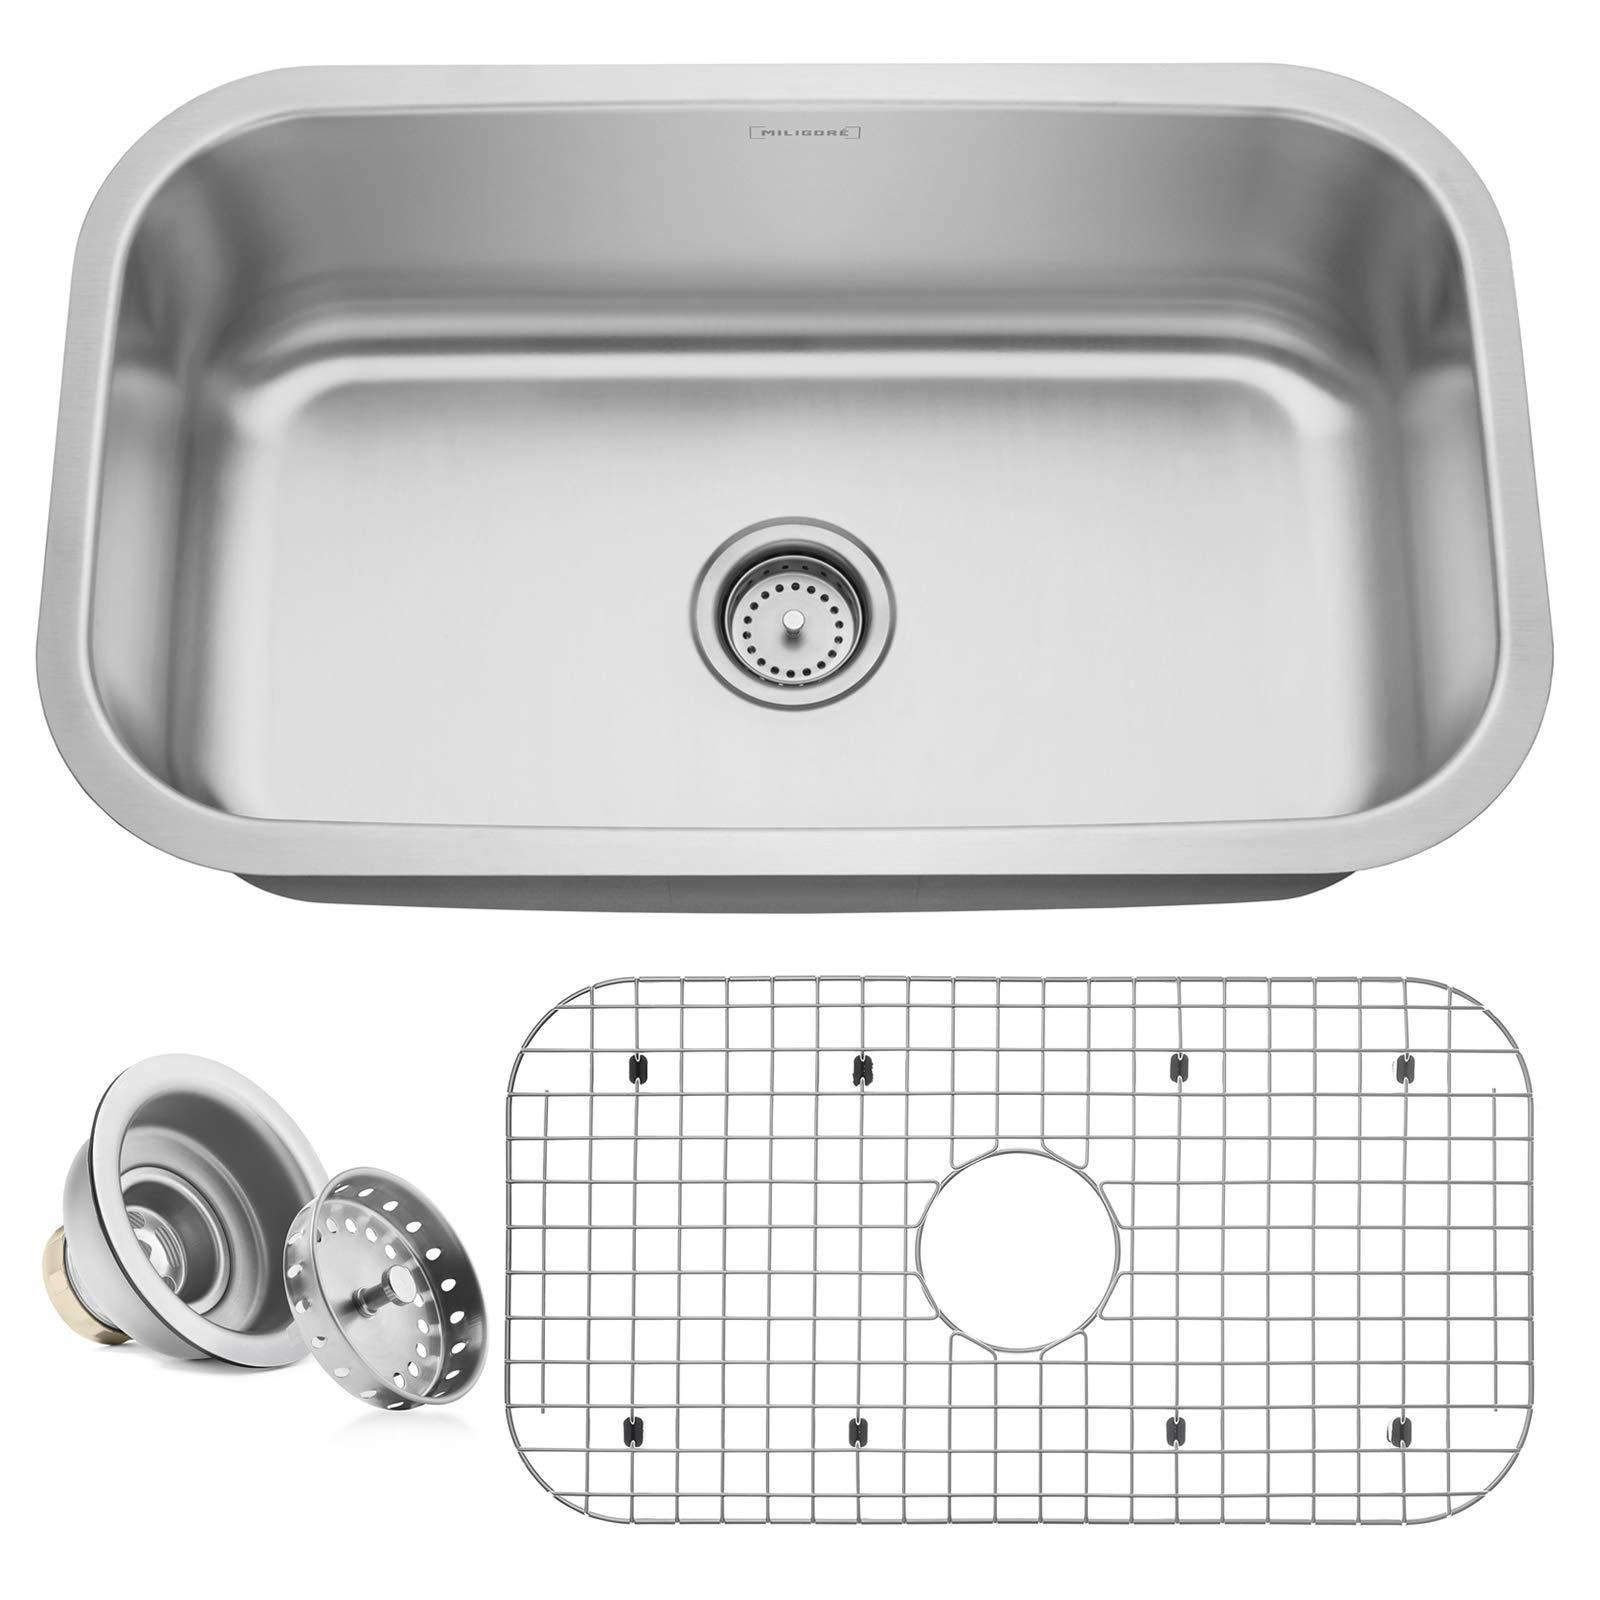 Miligore 30'' x 18'' x 9'' Deep Single Bowl Undermount 16-Gauge Stainless Steel Kitchen Sink - Includes Drain/Grid by Miligore